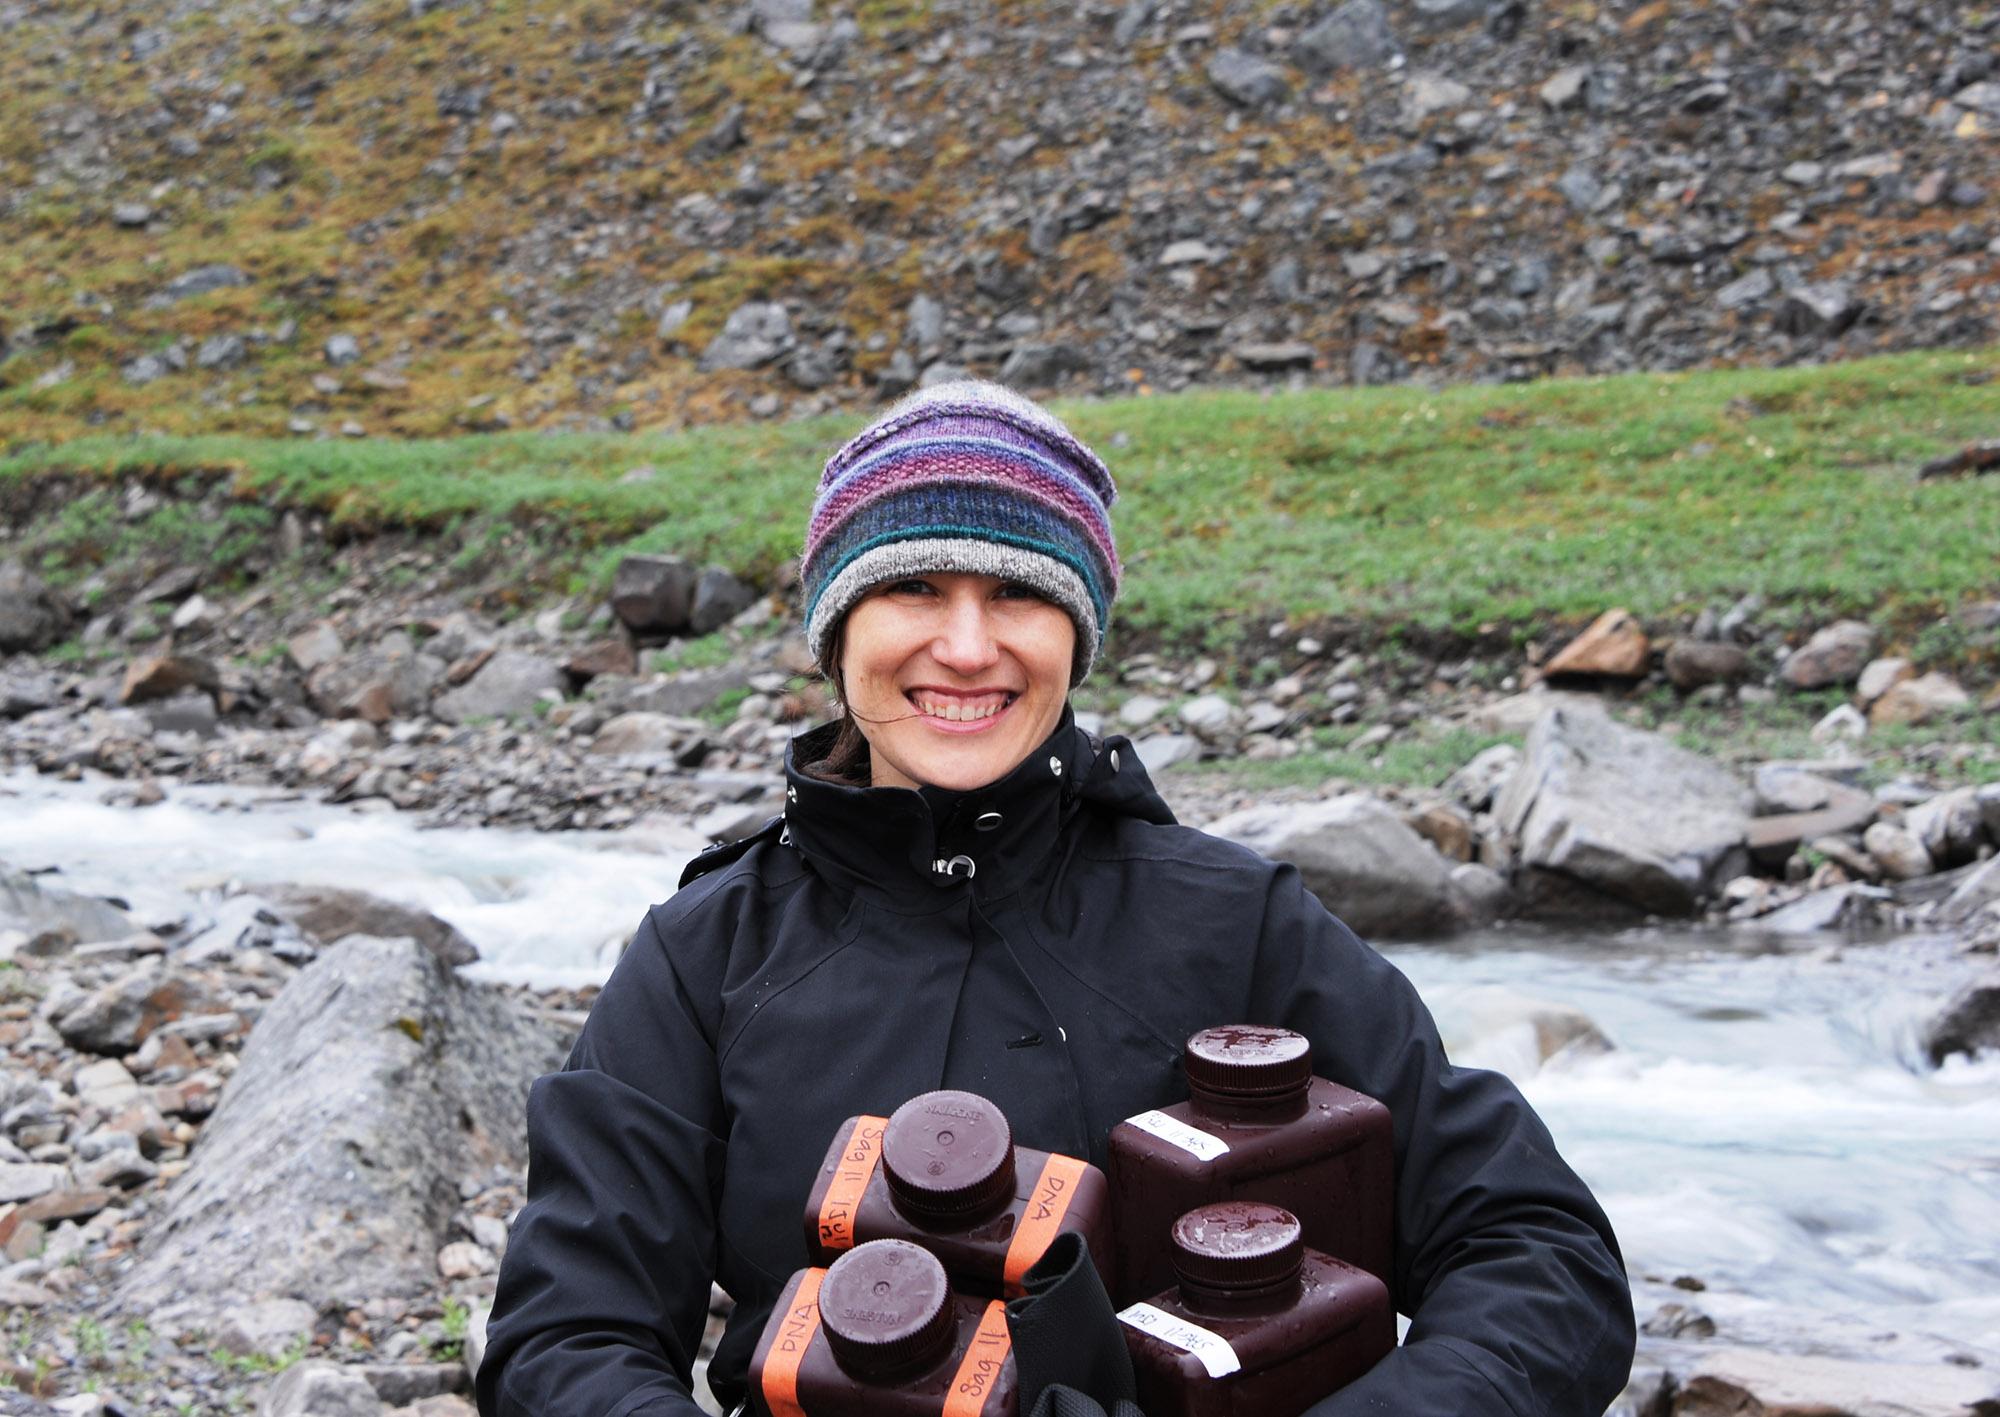 University of Michigan aquatic geochemist Rose M. Cory collects water from the Sagavanirktok River, Arctic Alaska. Image credit: George W. Kling